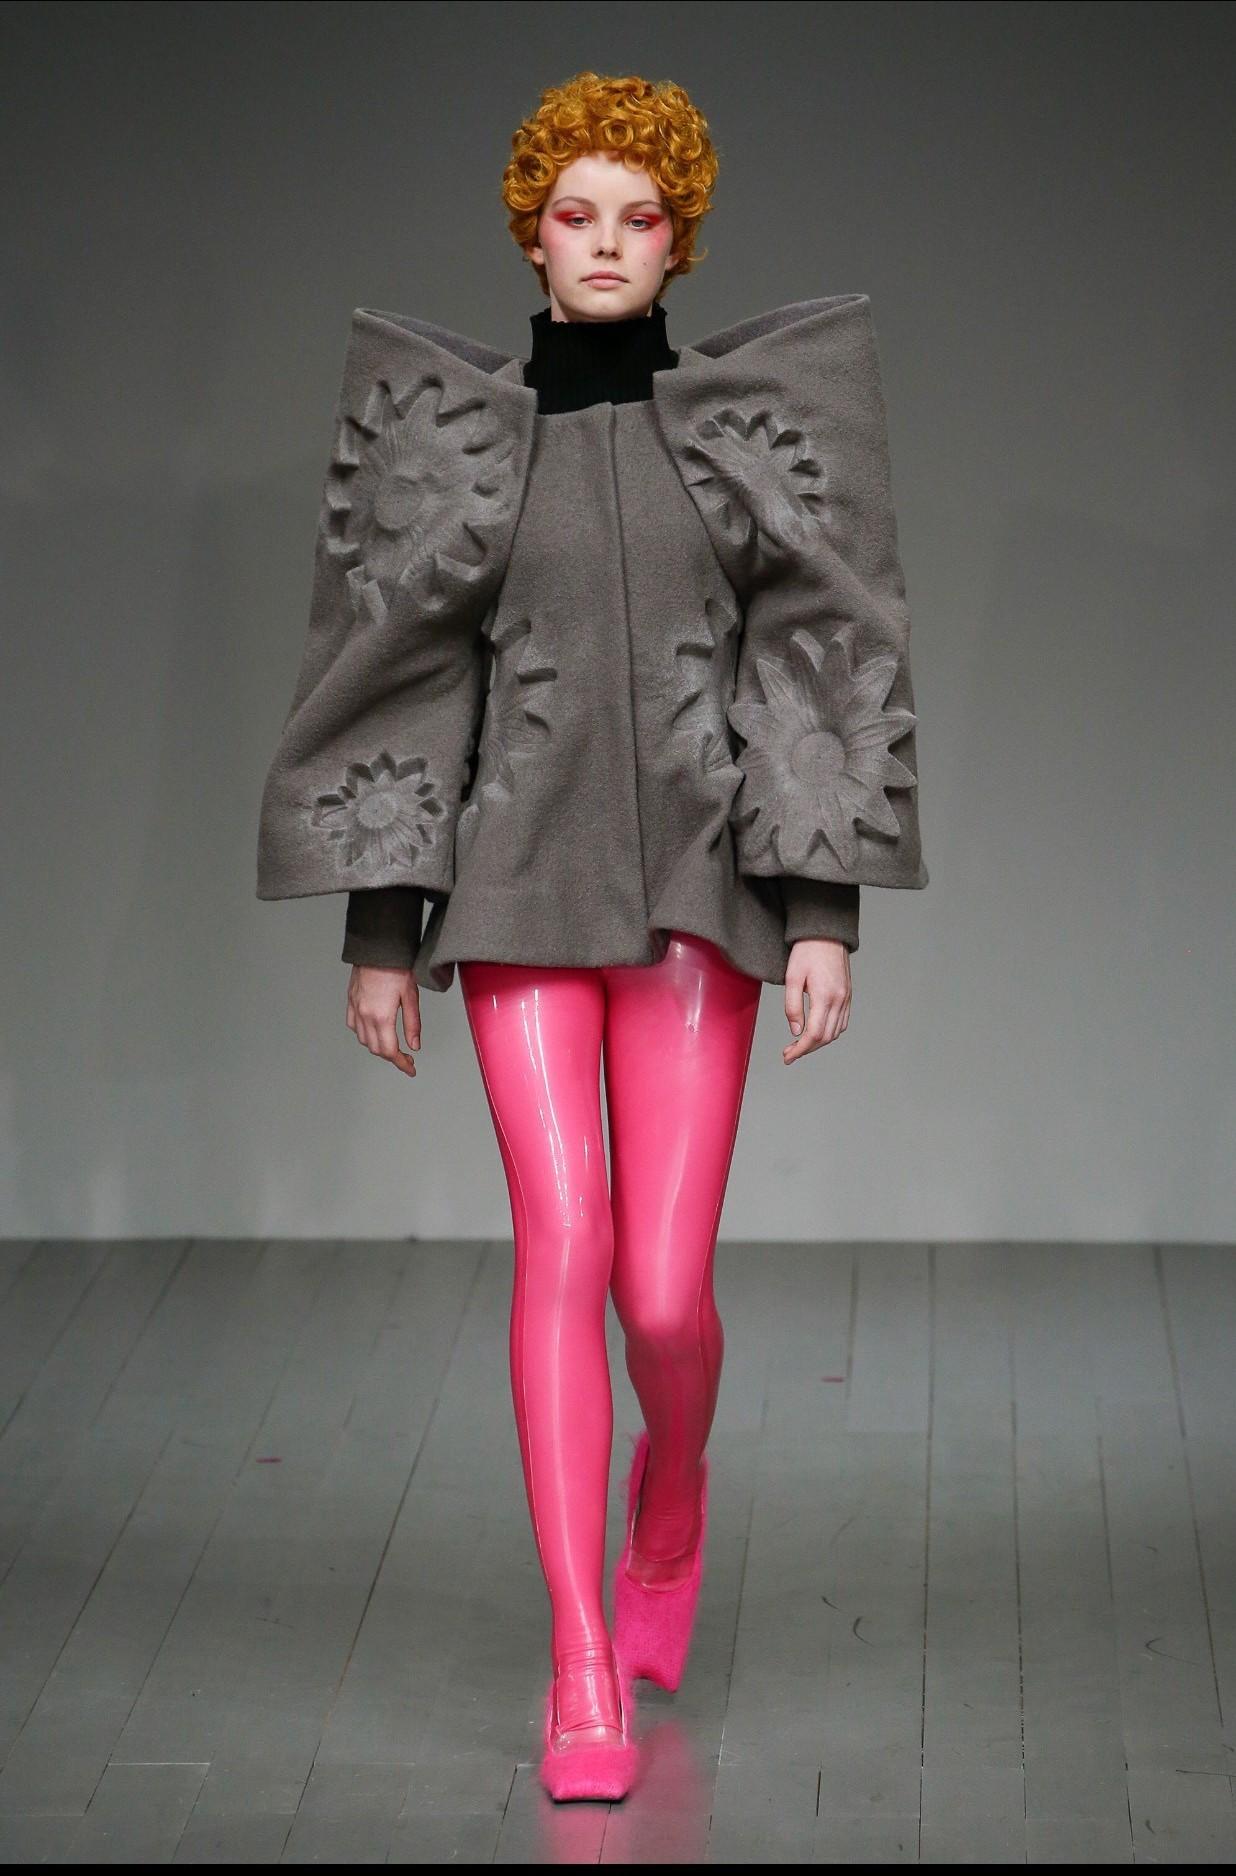 Libidex Leggings featured in the Central Saint Martin London Fashion week graduation Show.